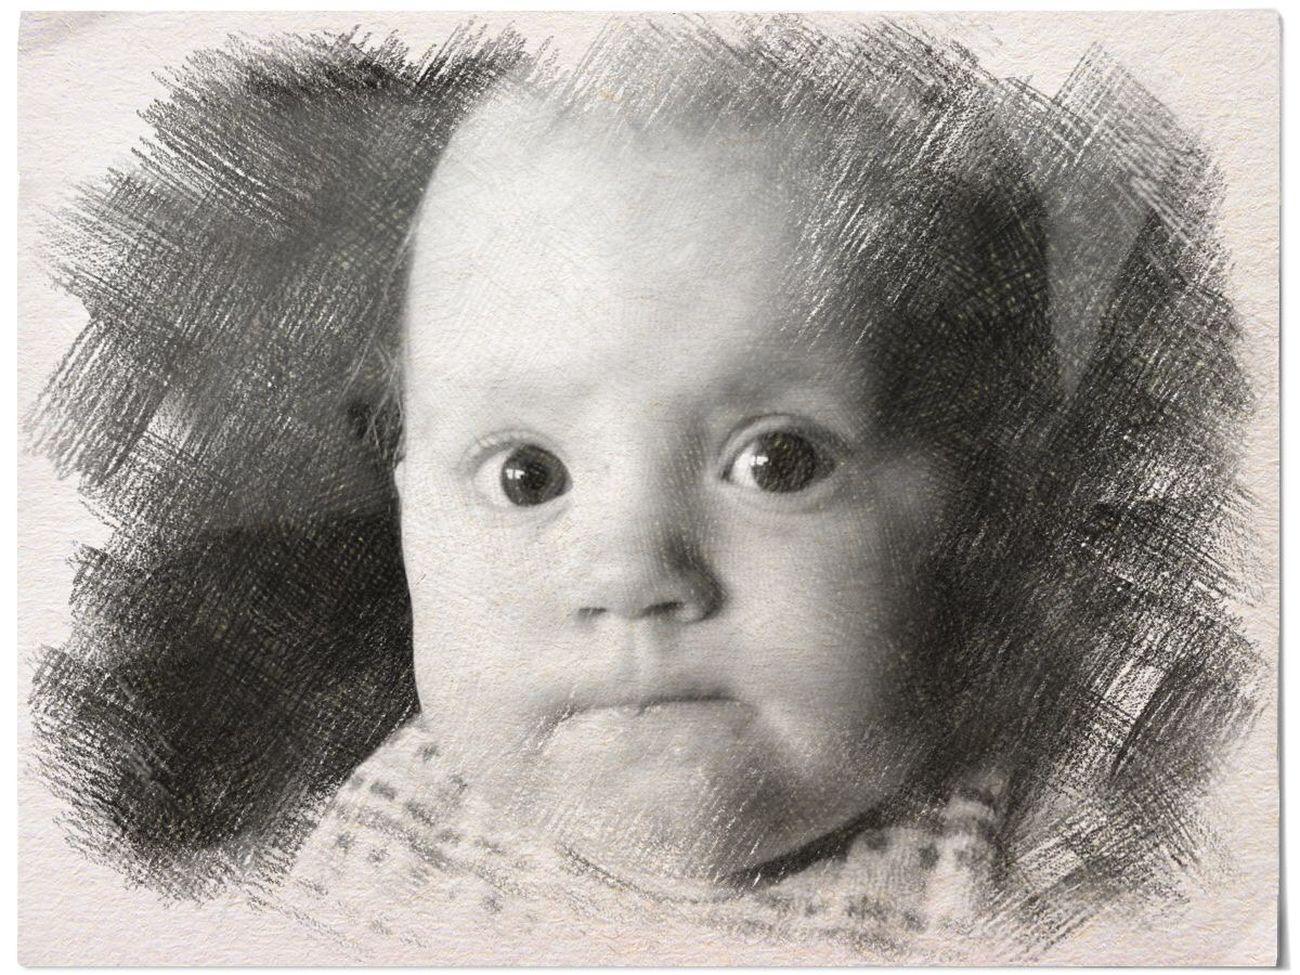 GraphitePencil Sophie Graphite Art Cuteeee♥♡♥ Peoplephotography Babygirl Portrait Capture The Moment Children's Portraits